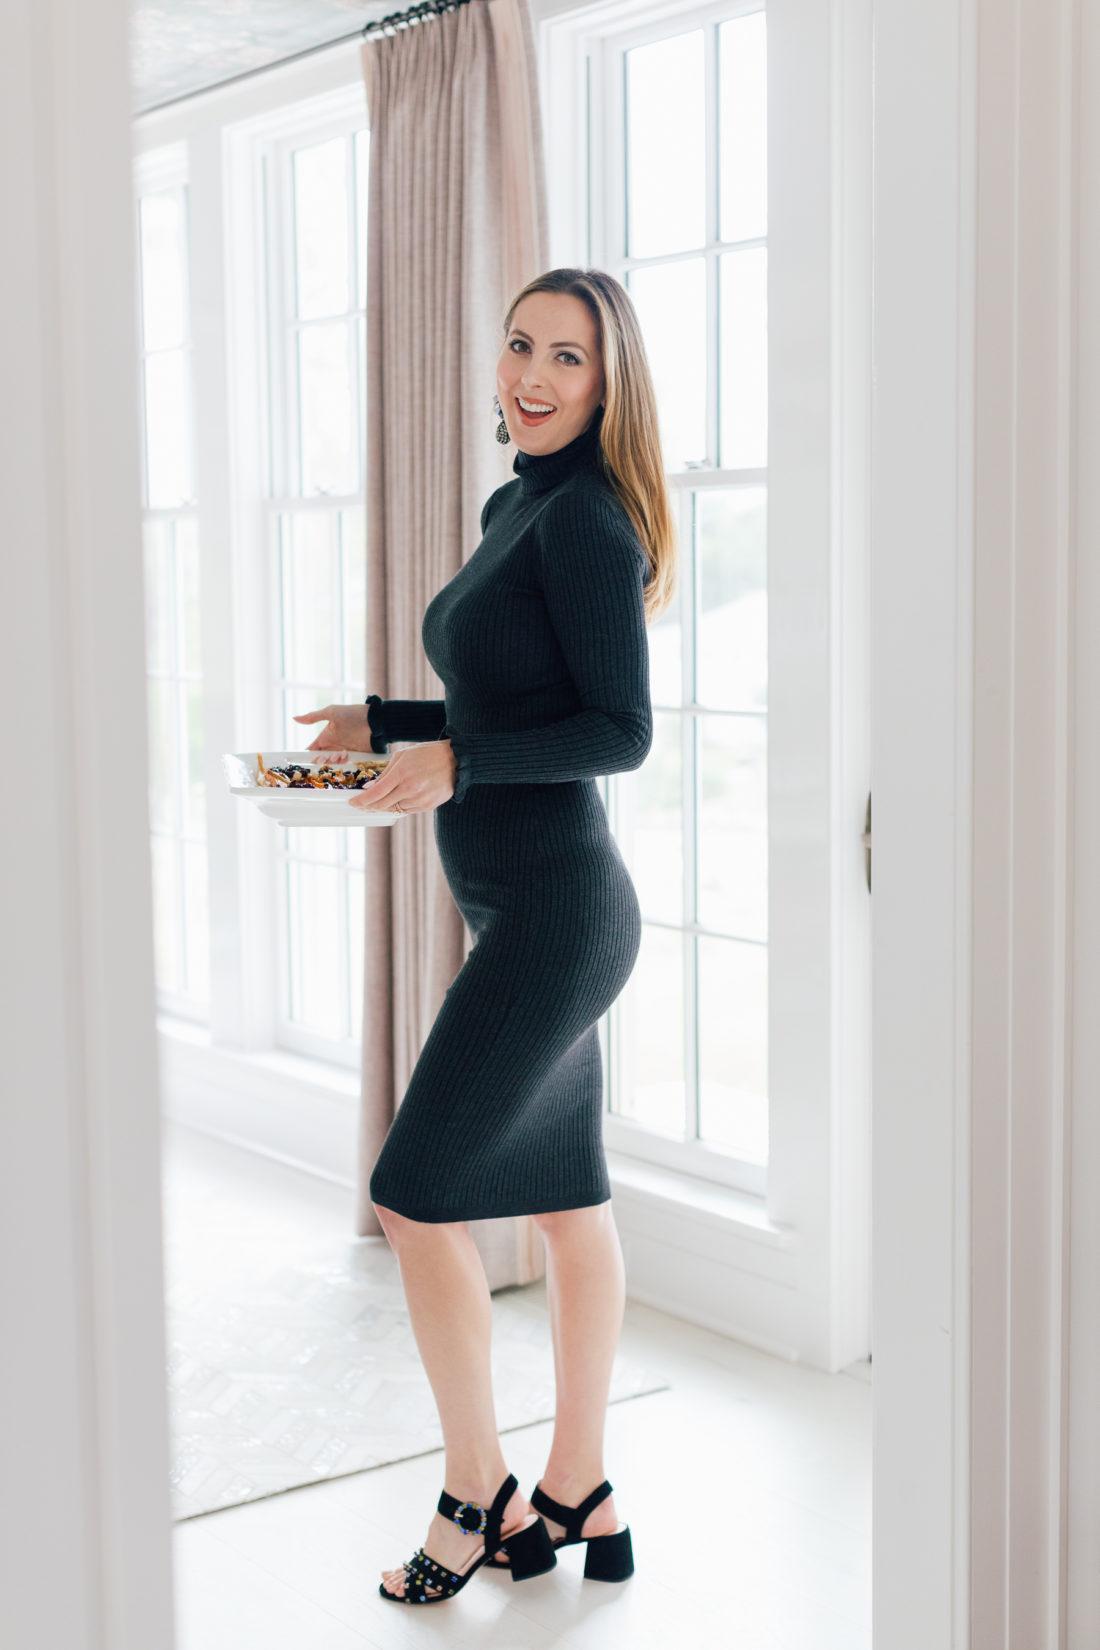 Eva Amurri Martino whips up some Thanksgiving side dishes